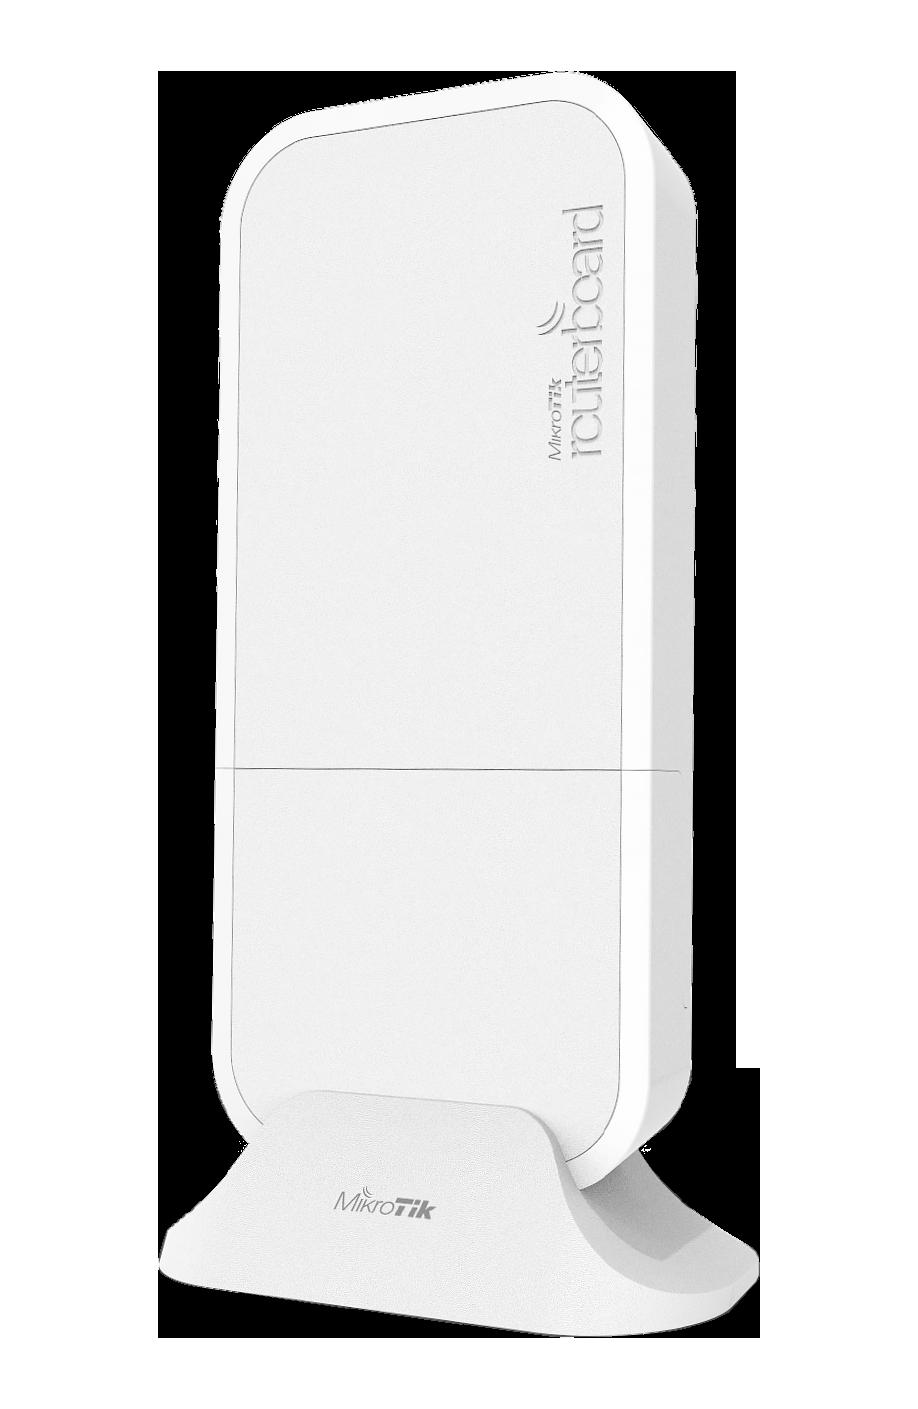 RBwAPR-2nD_R11e-LTE Mikrotik RBwAPR-2nD R11e-LTE 2.4 GHZ 2x2 Mimo ,L4 , 2 Dbi,Dış & iç Ortam Verici / Ap 802.11b/g/n,2G/3G/4G